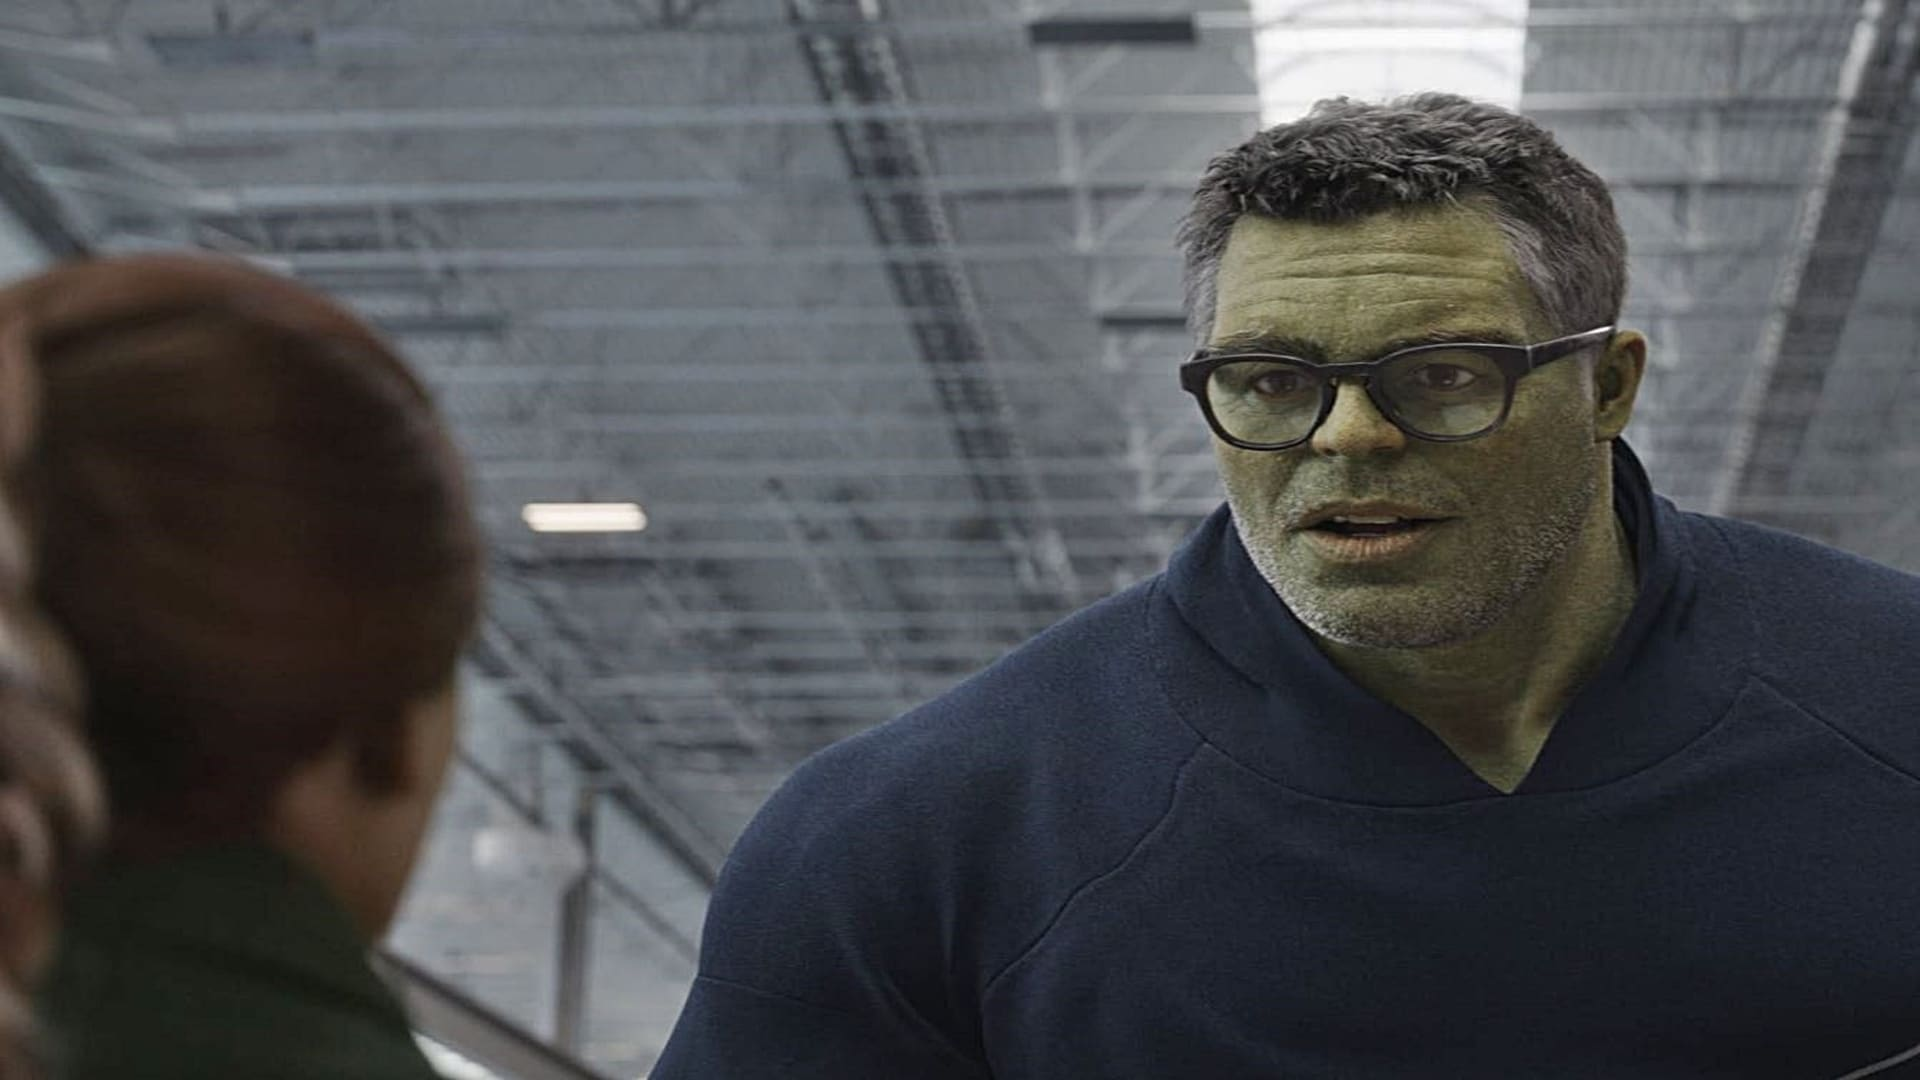 Mark Buffalo as the Hulk